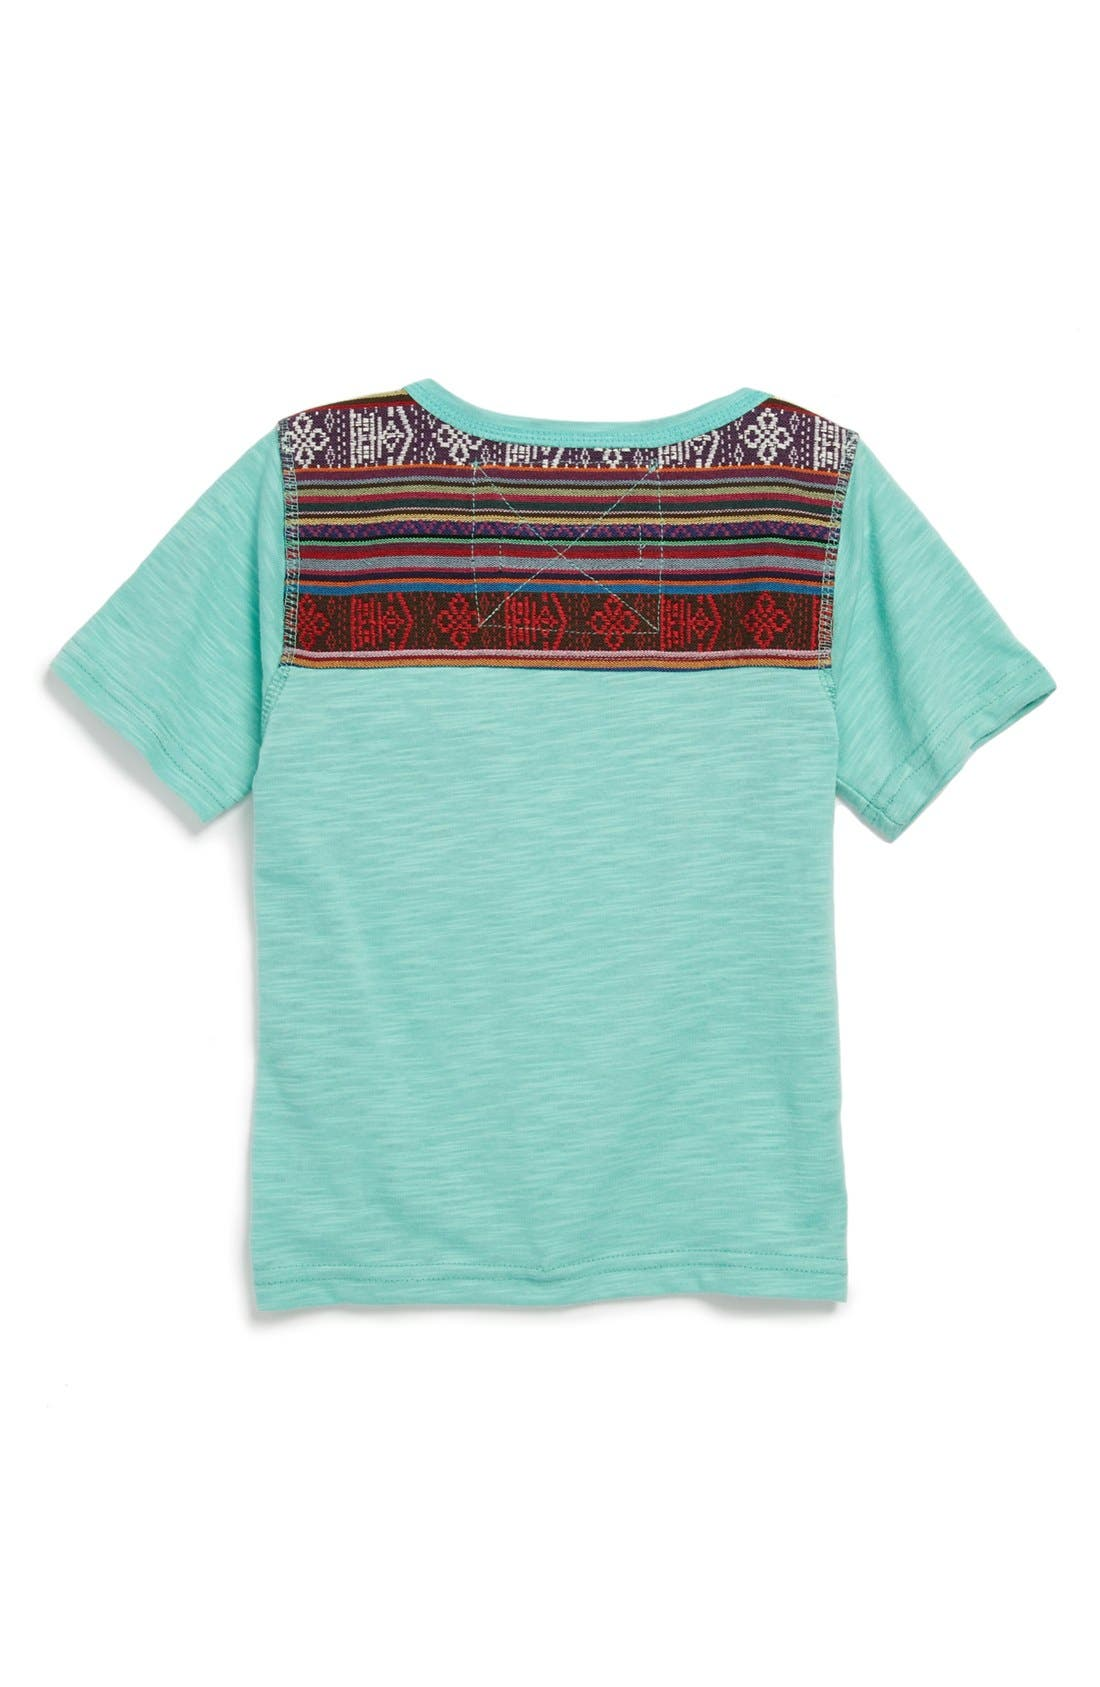 Alternate Image 2  - Sovereign Code Contrast Pocket T-Shirt (Toddler Boys)